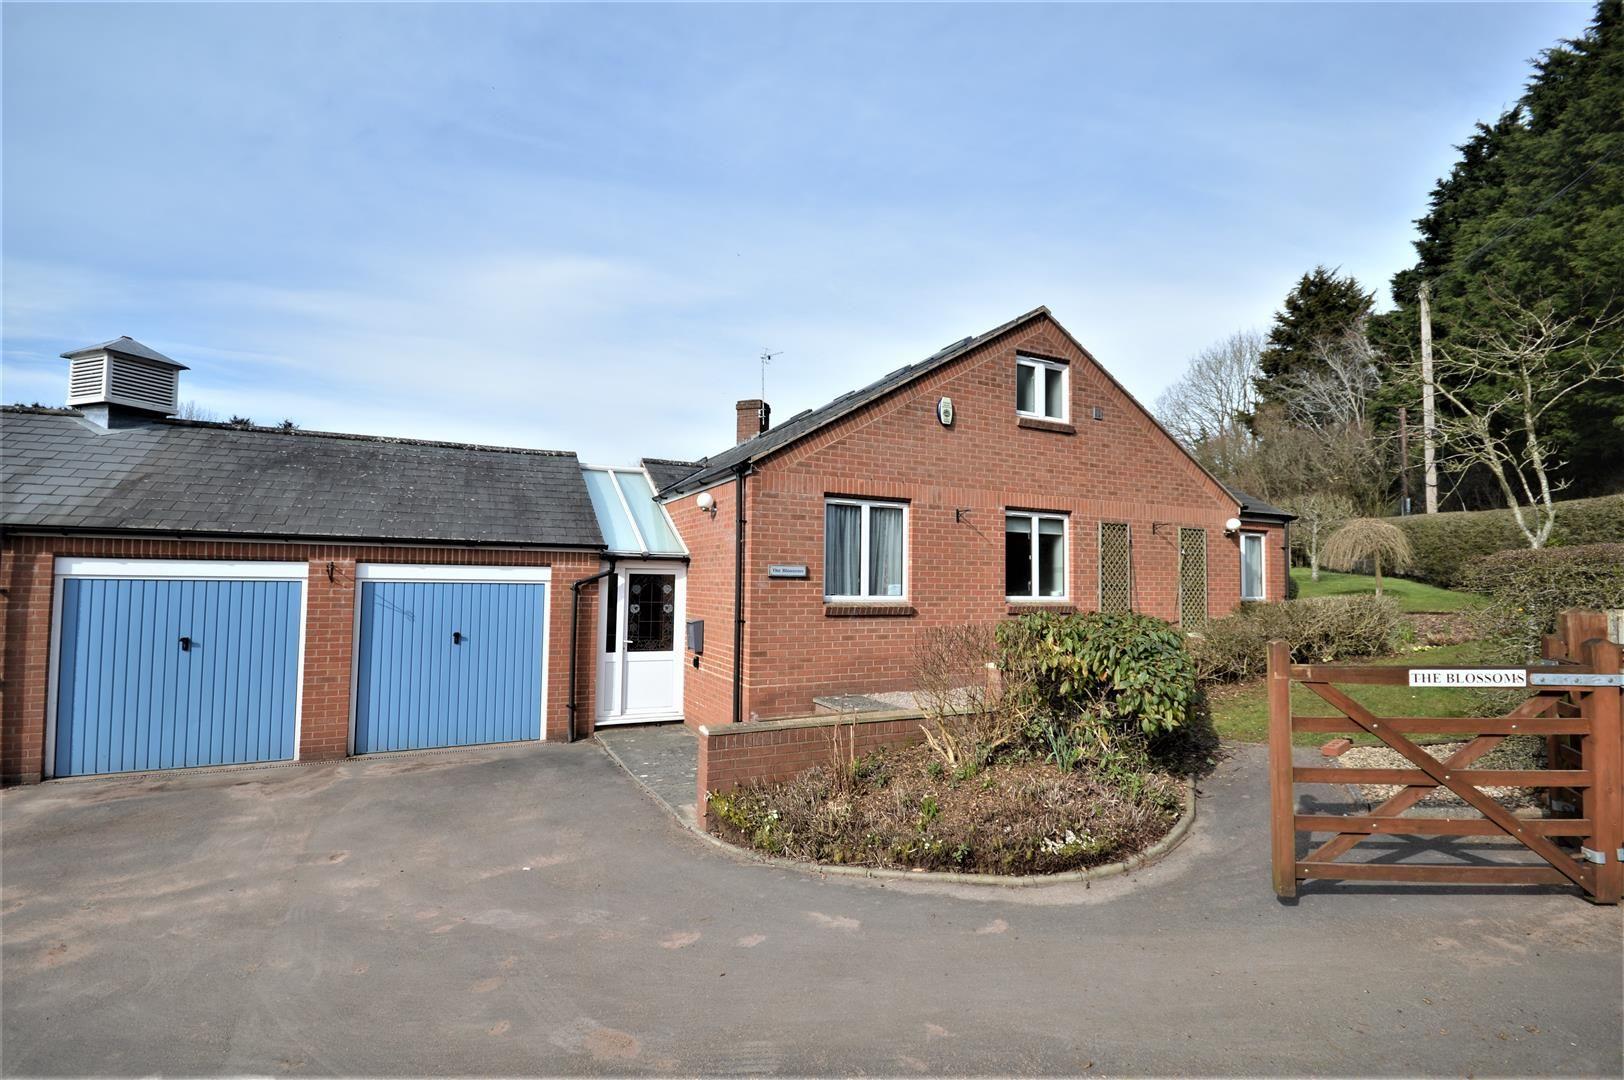 4 bed detached for sale in Ballingham, Carey, HR2